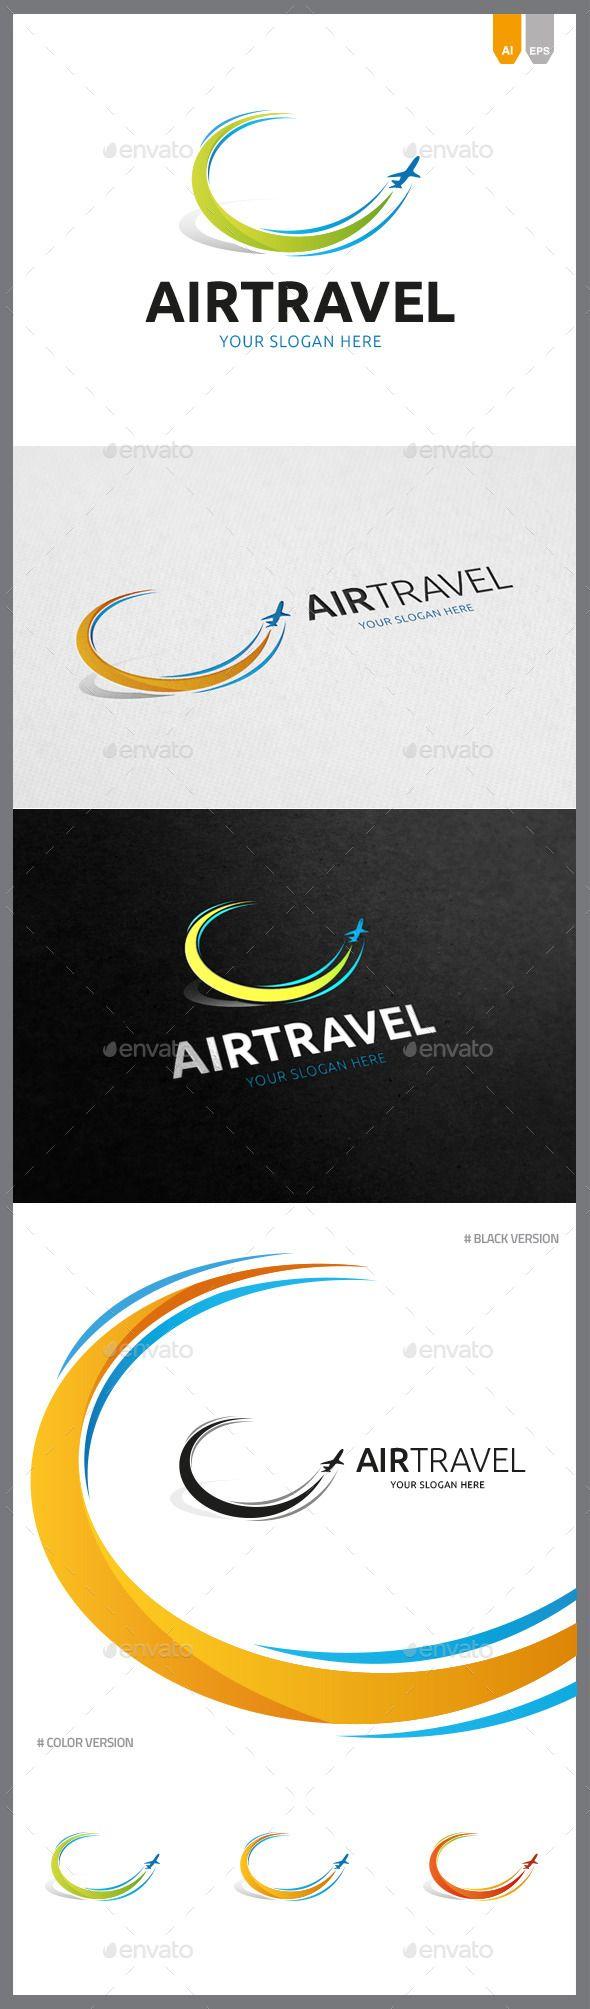 Air Travel  - Logo Design Template Vector #logotype Download it here: http://graphicriver.net/item/air-travel-logo/9167828?s_rank=1477?ref=nesto